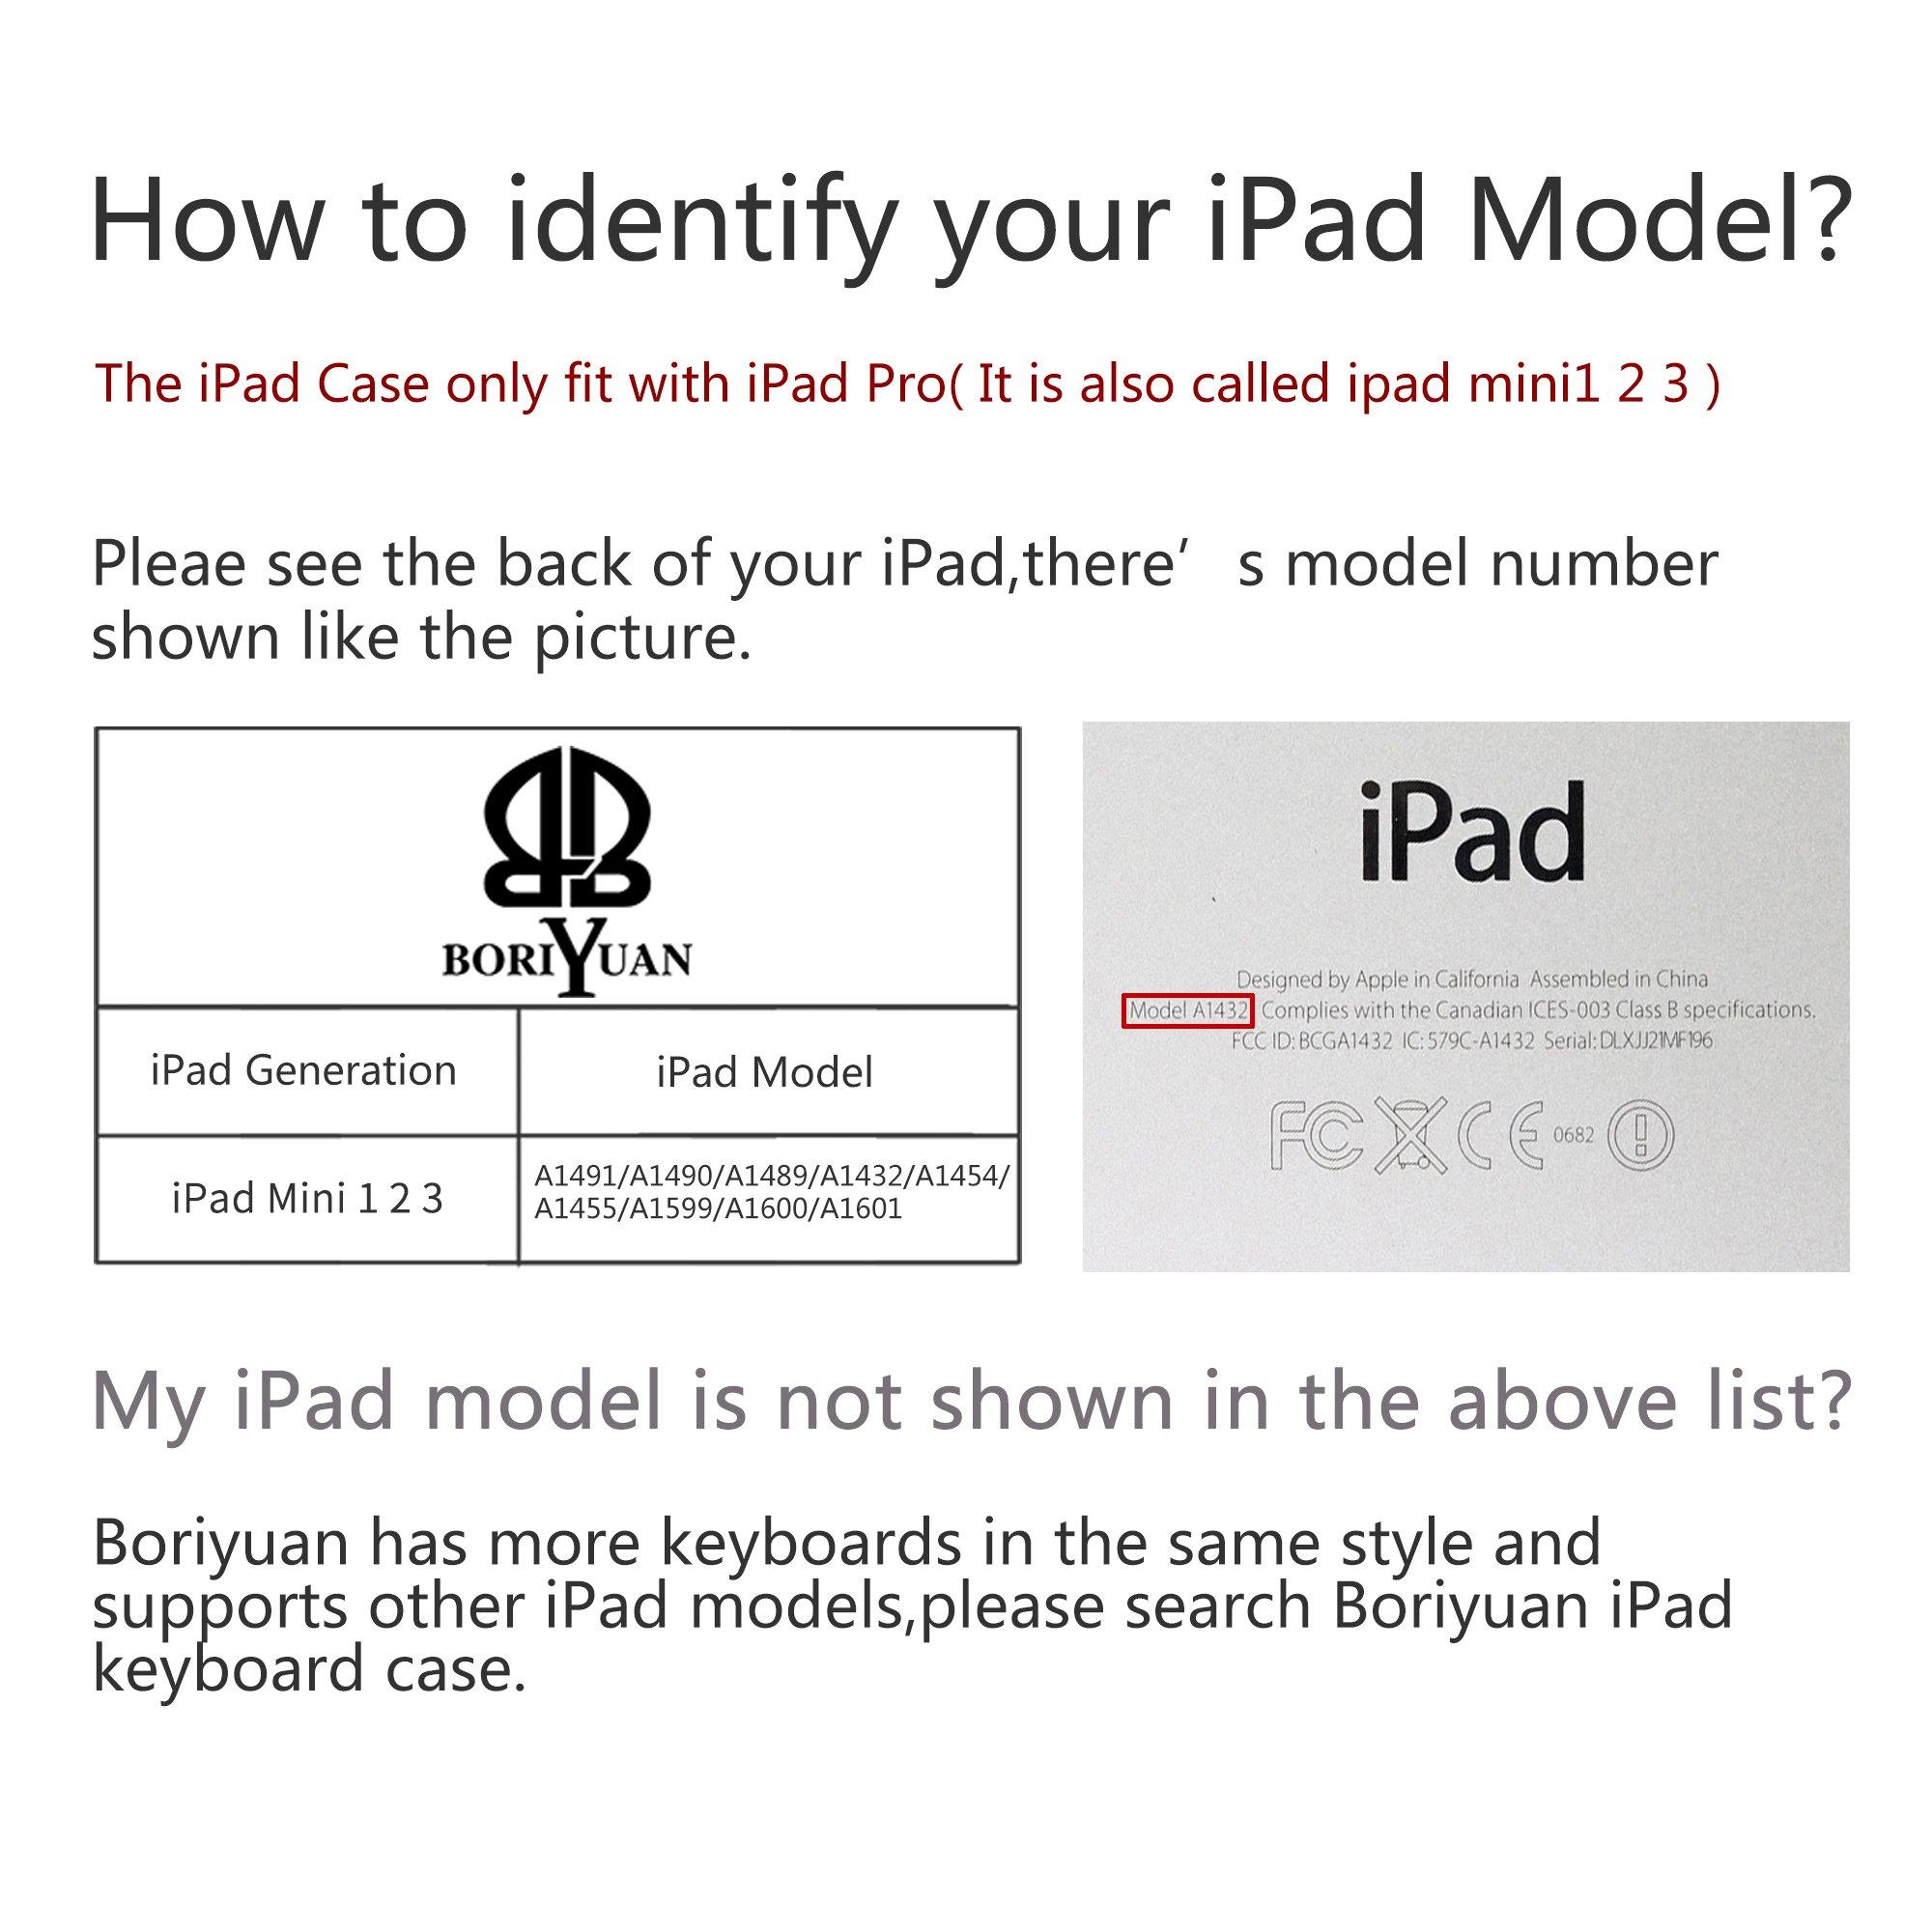 iPad Mini Keyboard Case,Boriyuan iPad Mini Smart Case Stand Folio Leather Cover with Detachable Wireless Bluetooth Keyboard and Screen Protector +Stylus for Apple iPad Mini 1/Mini 2/Mini 3 (Black) by Boriyuan (Image #7)